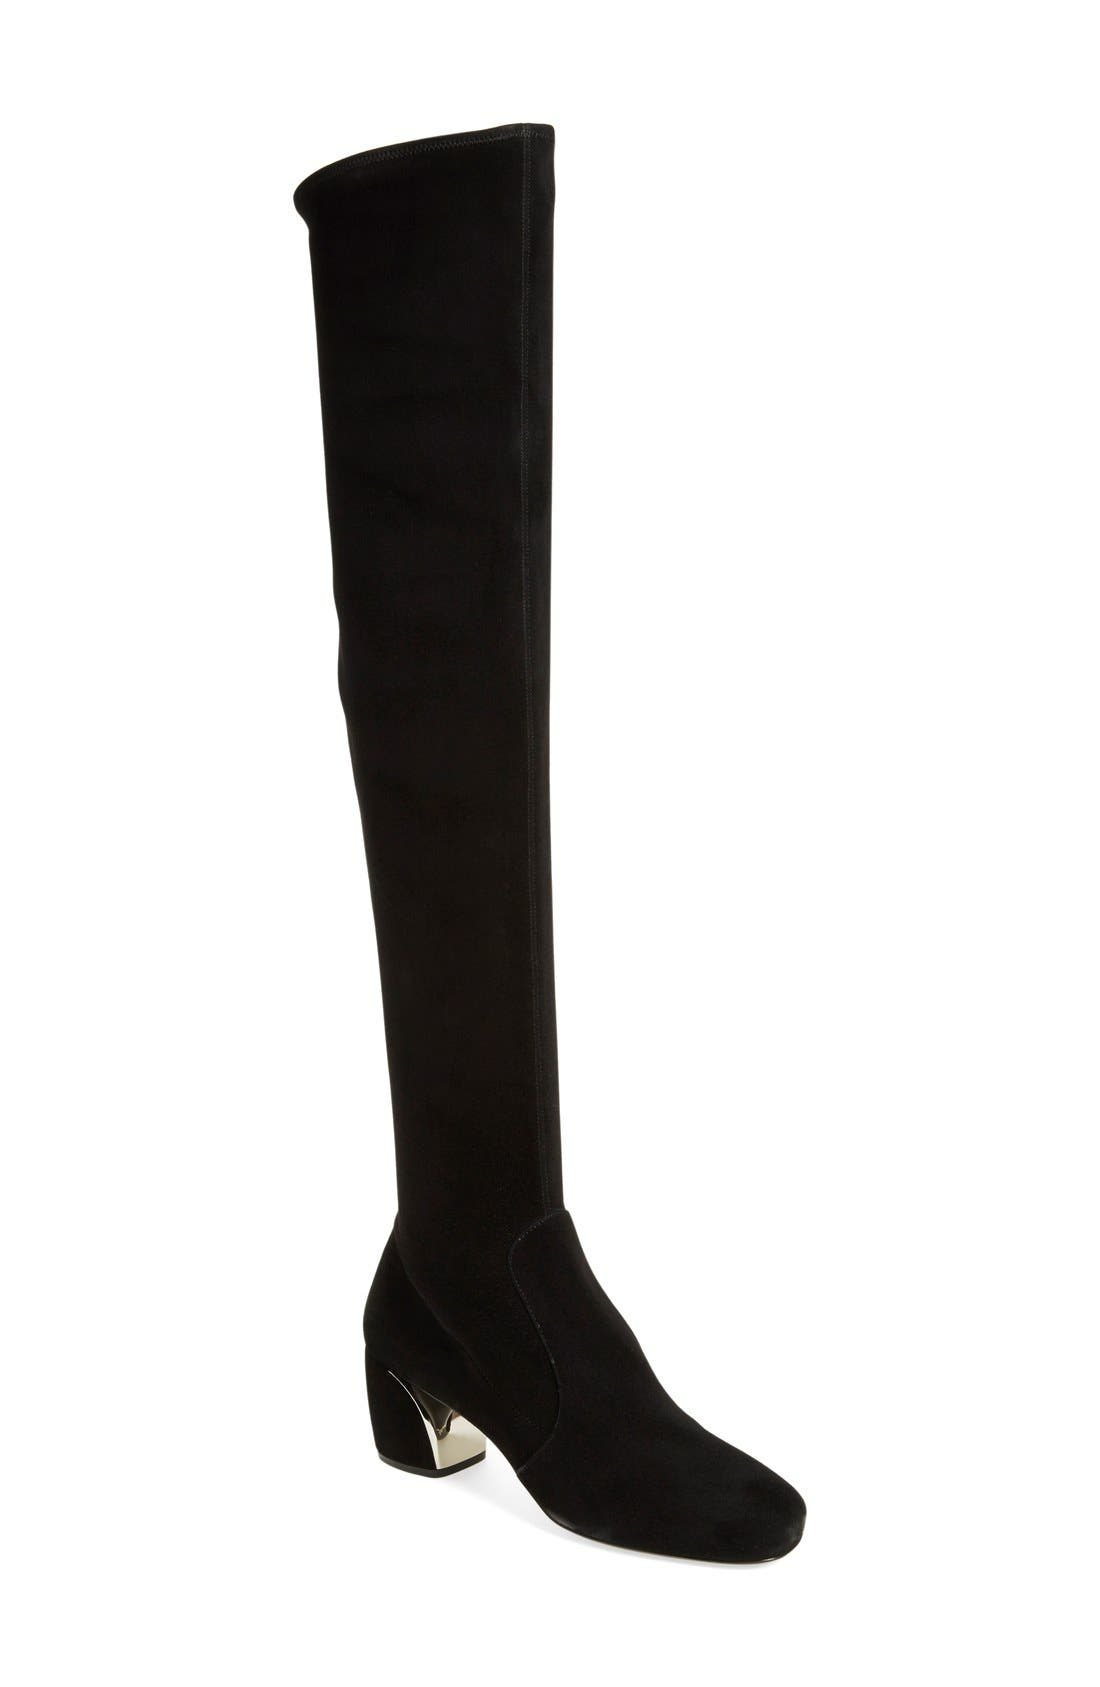 Alternate Image 1 Selected - Prada Over the Knee Boot (Women)